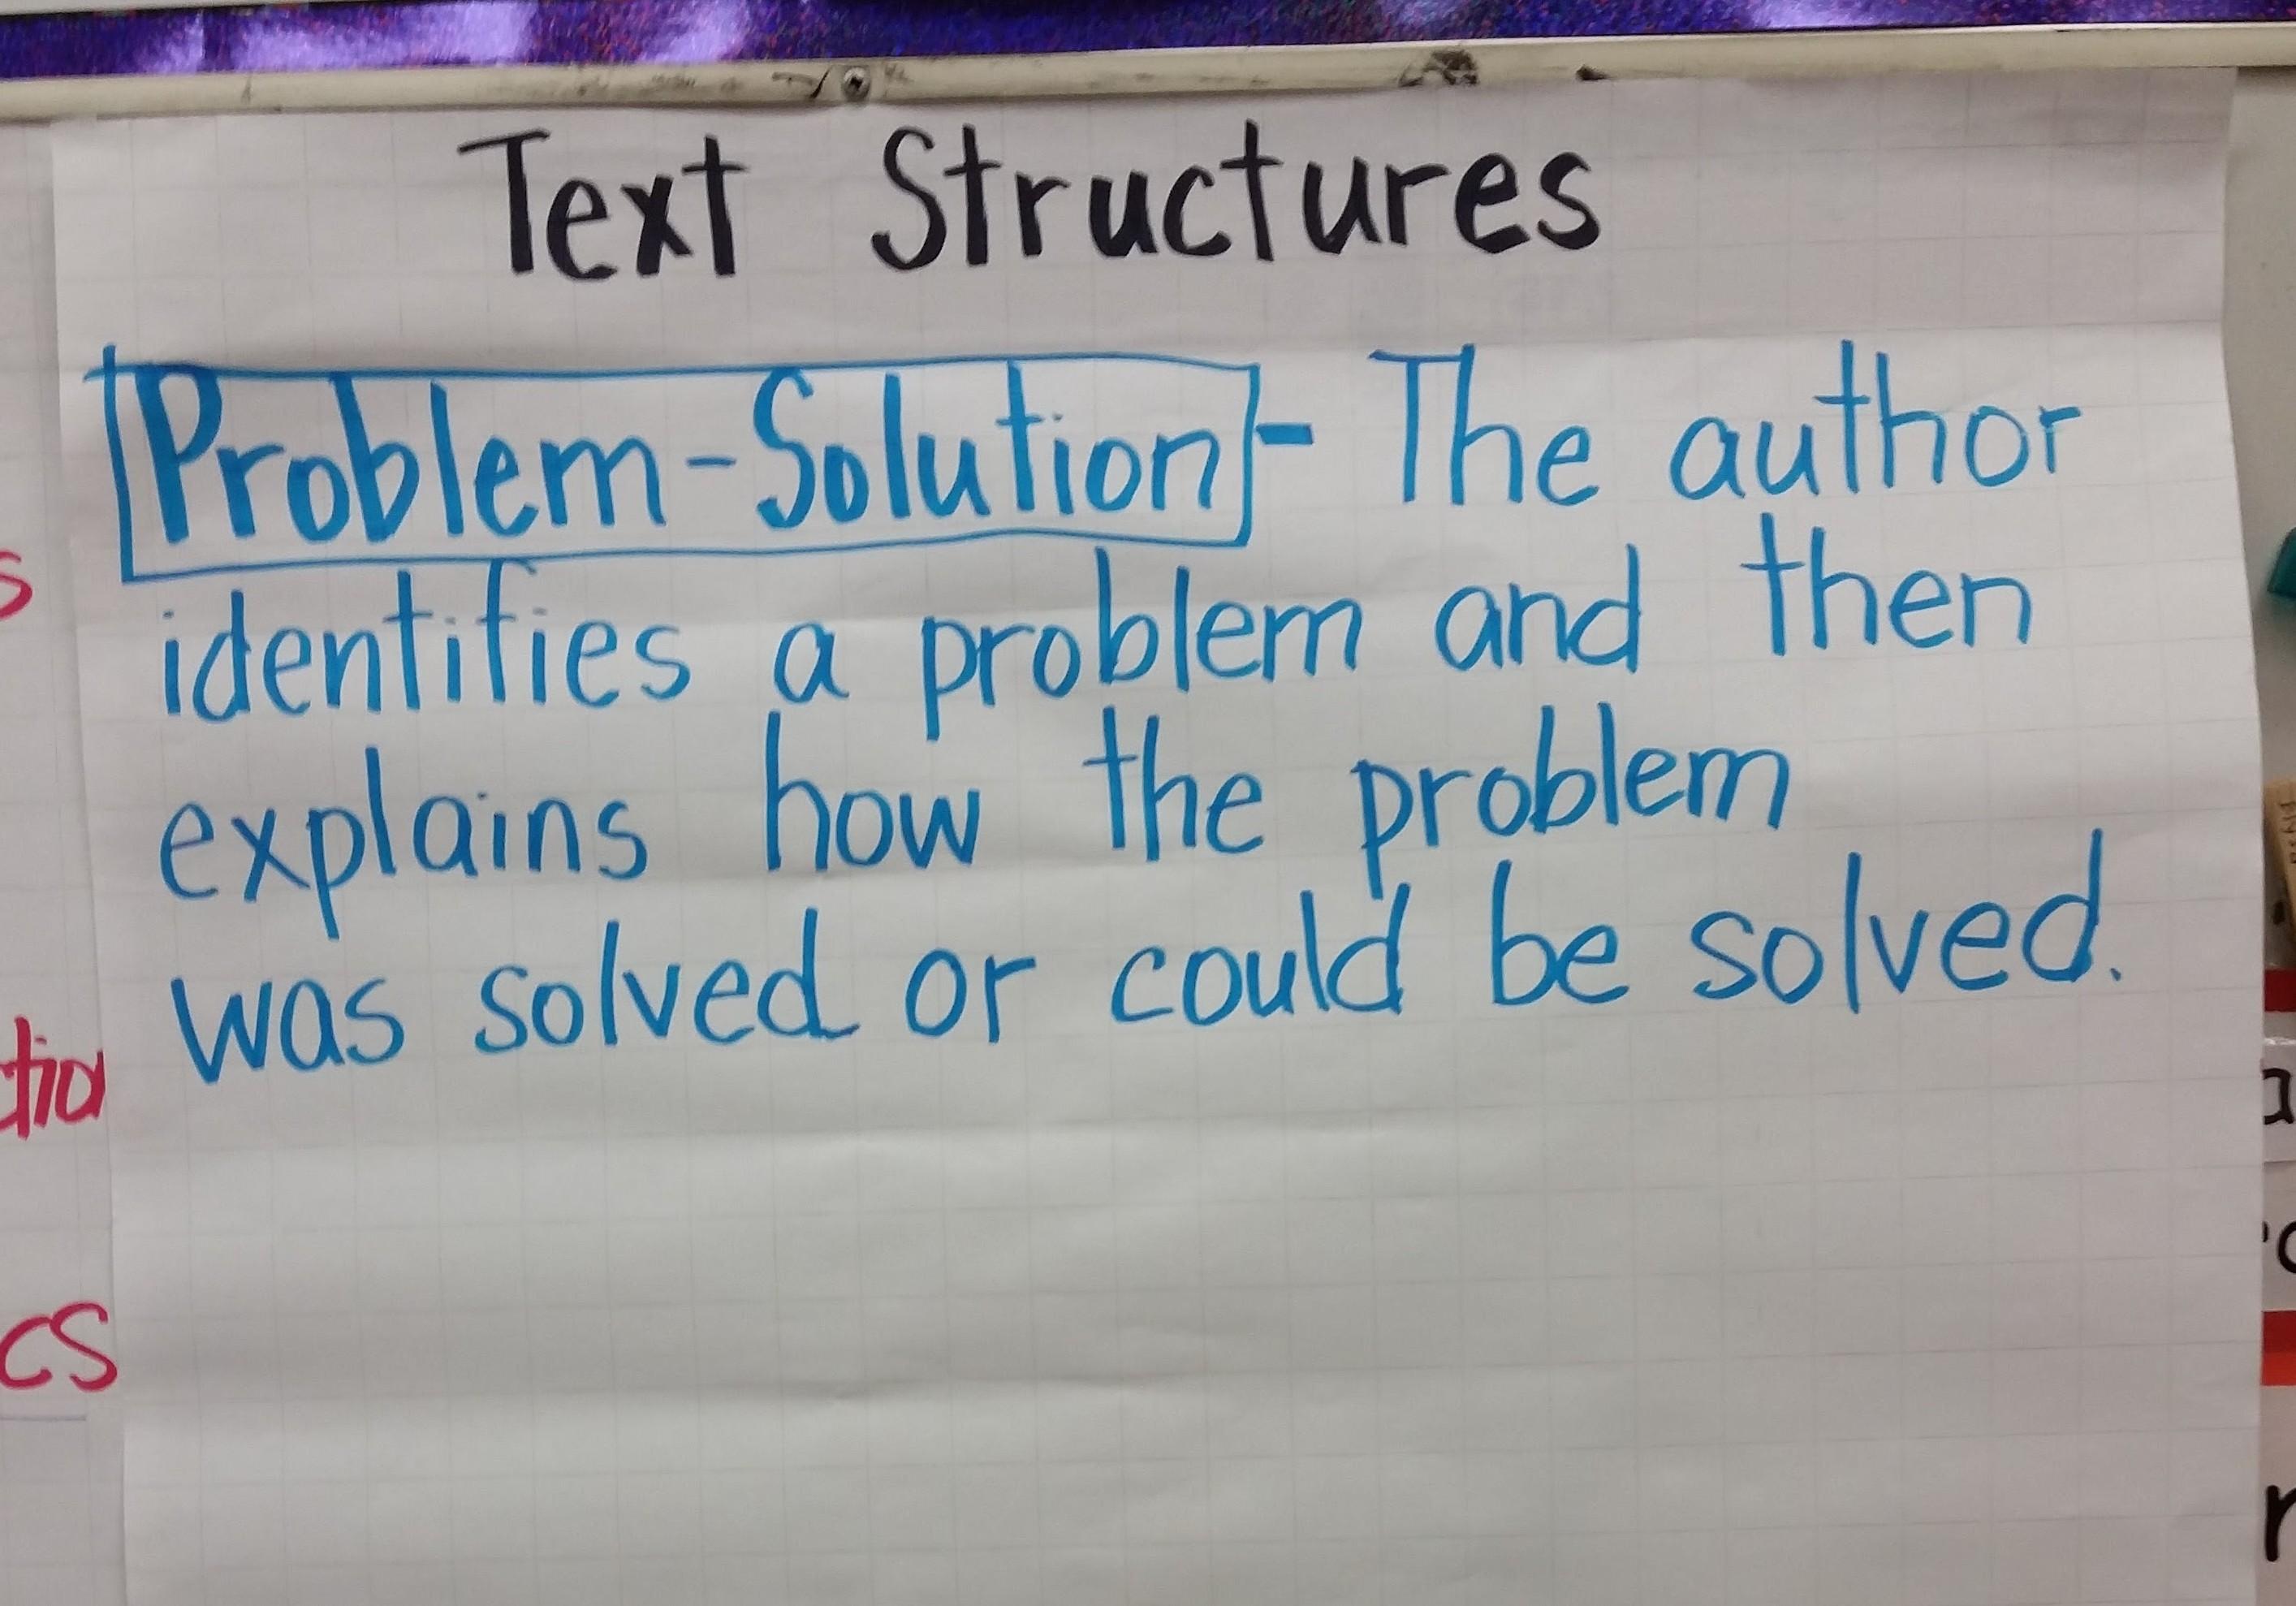 Problem Solution Text Structure